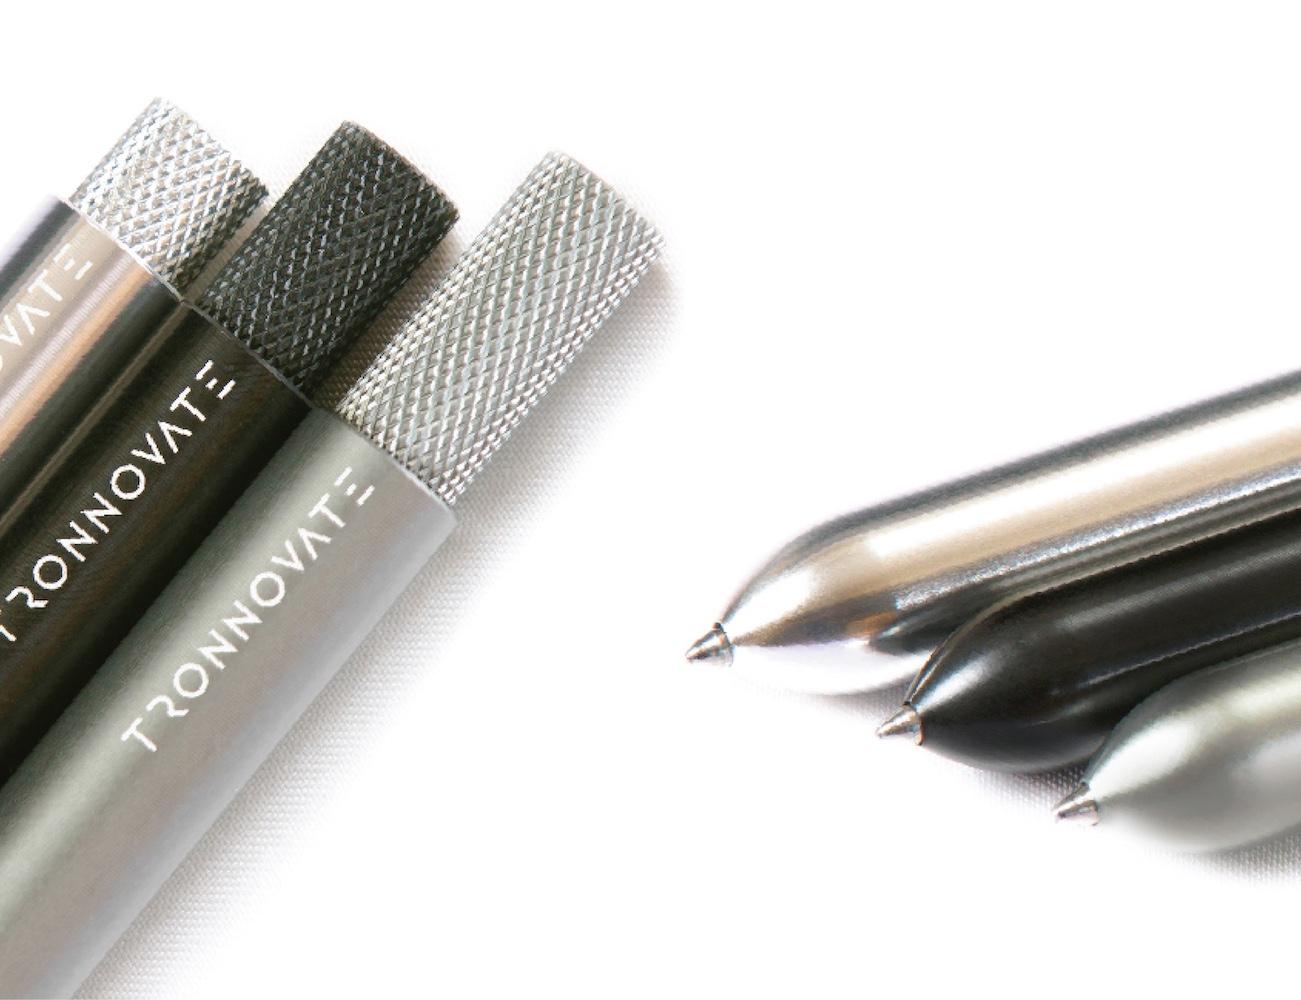 ORBIT – The World' Most Fabulous, Refillable & Creative Pen!